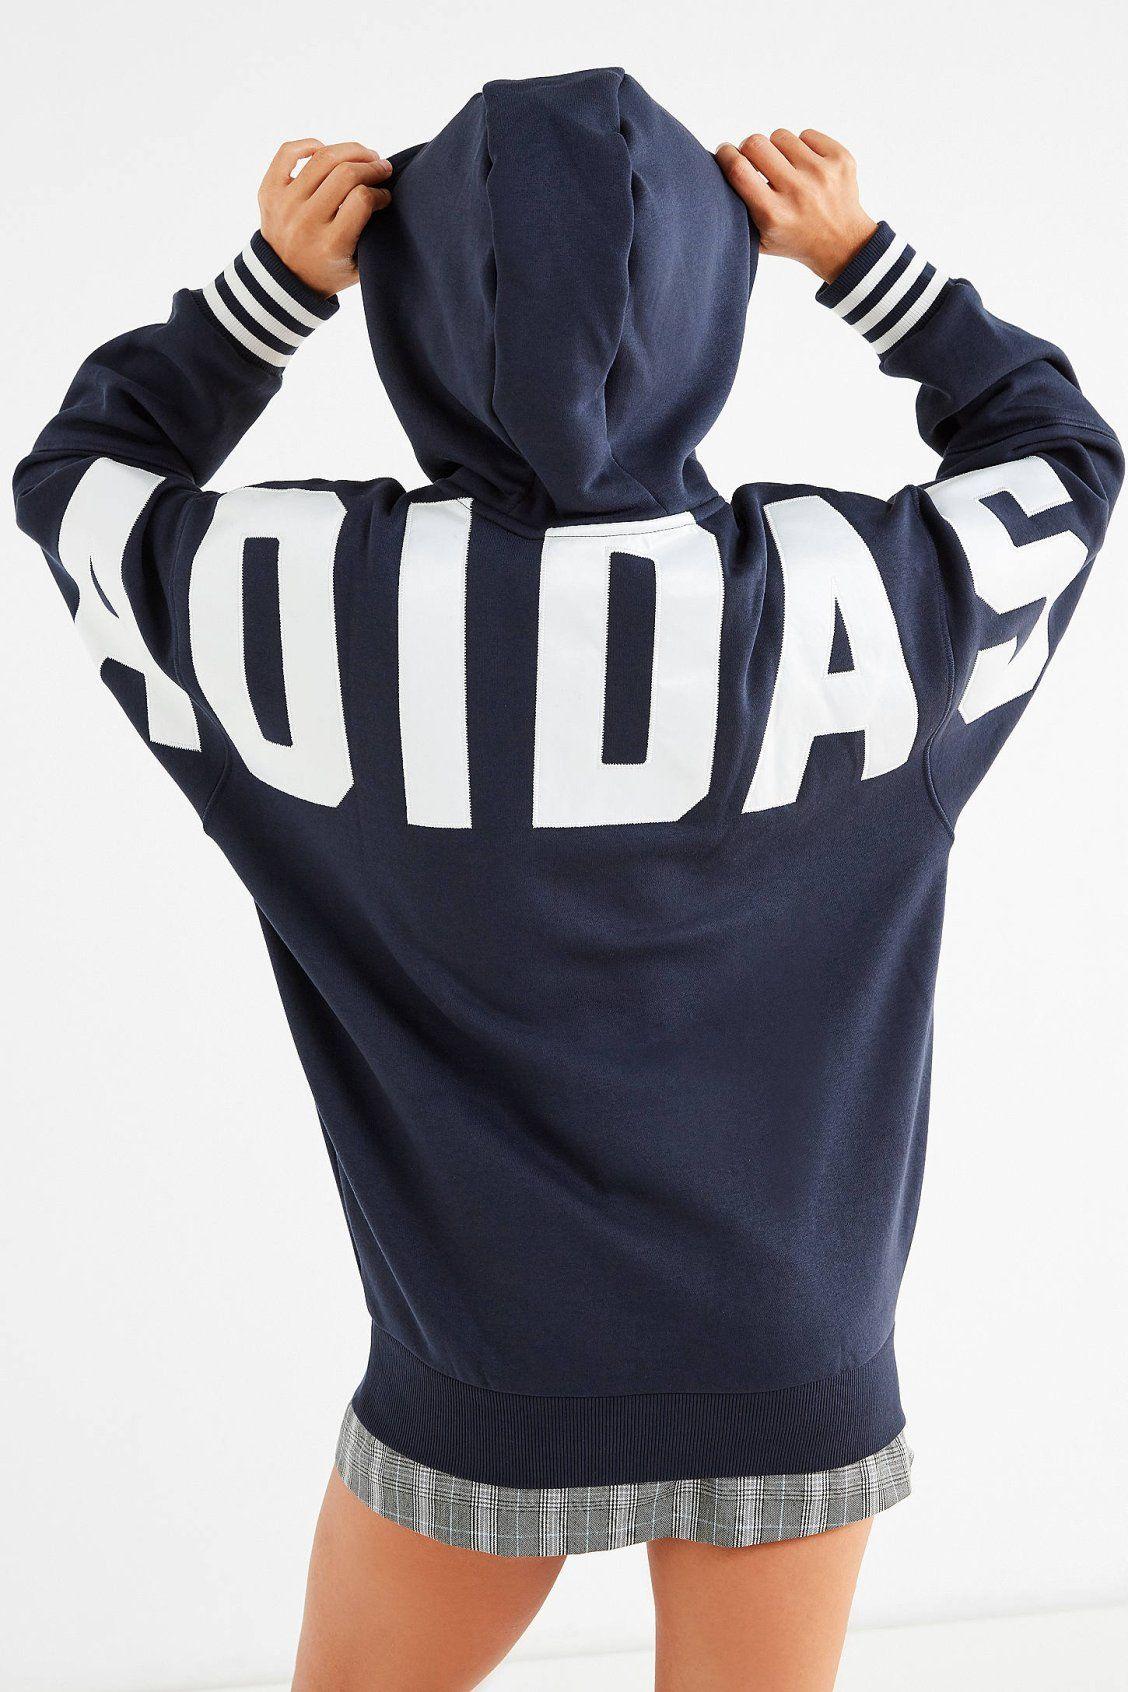 bb3beeb10f25 adidas Originals Fuzzy Hoodie Sweatshirt